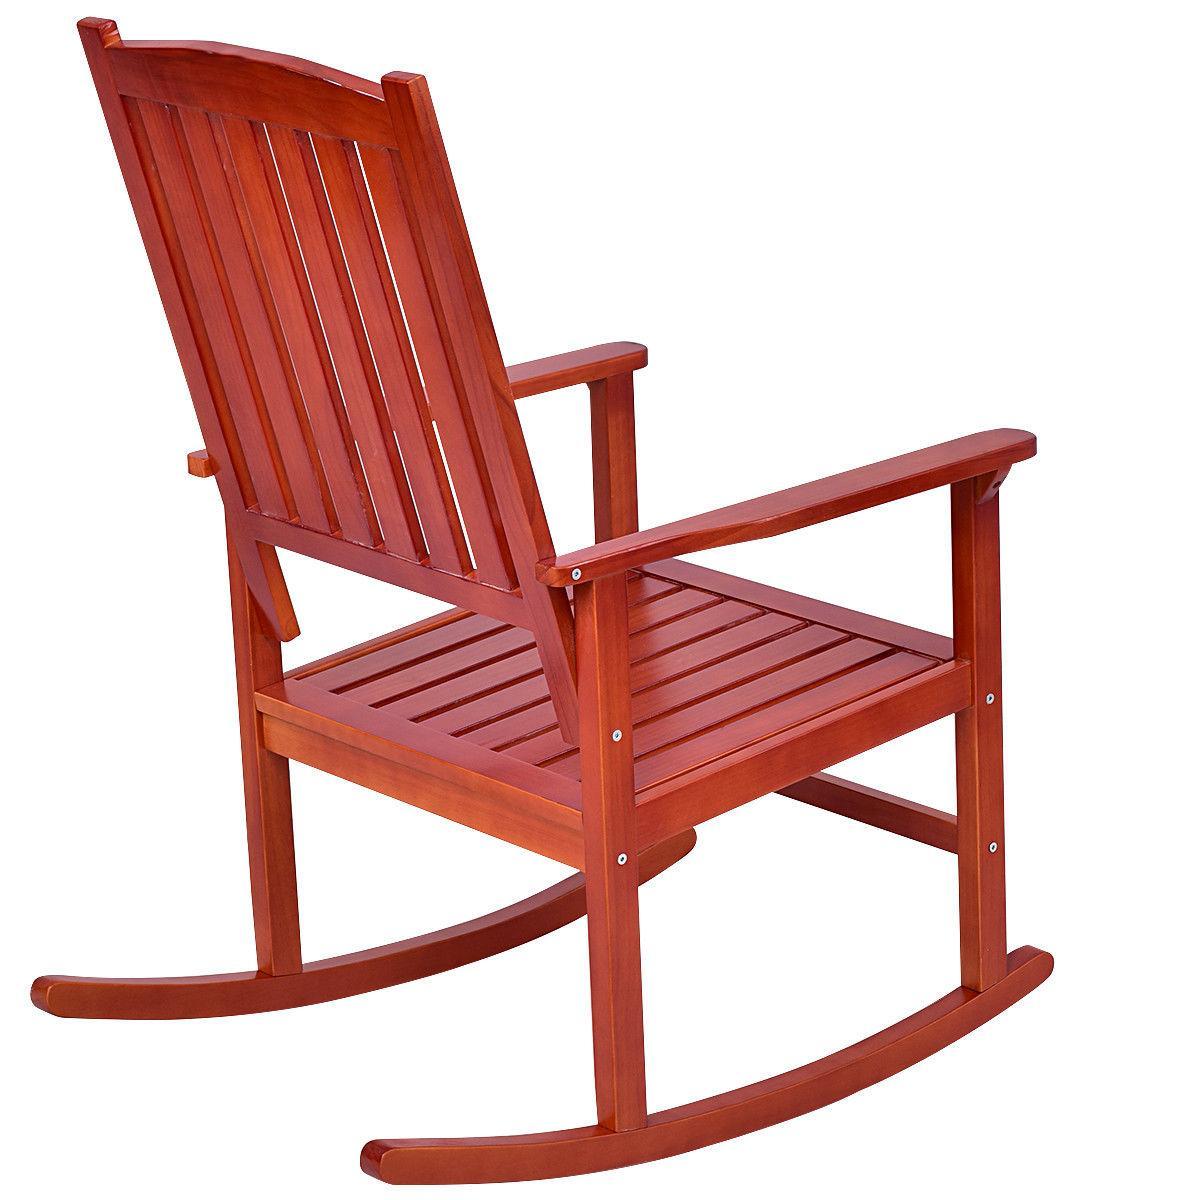 Set of Wood Rocking Chair Porch Indoor Deck Furniture